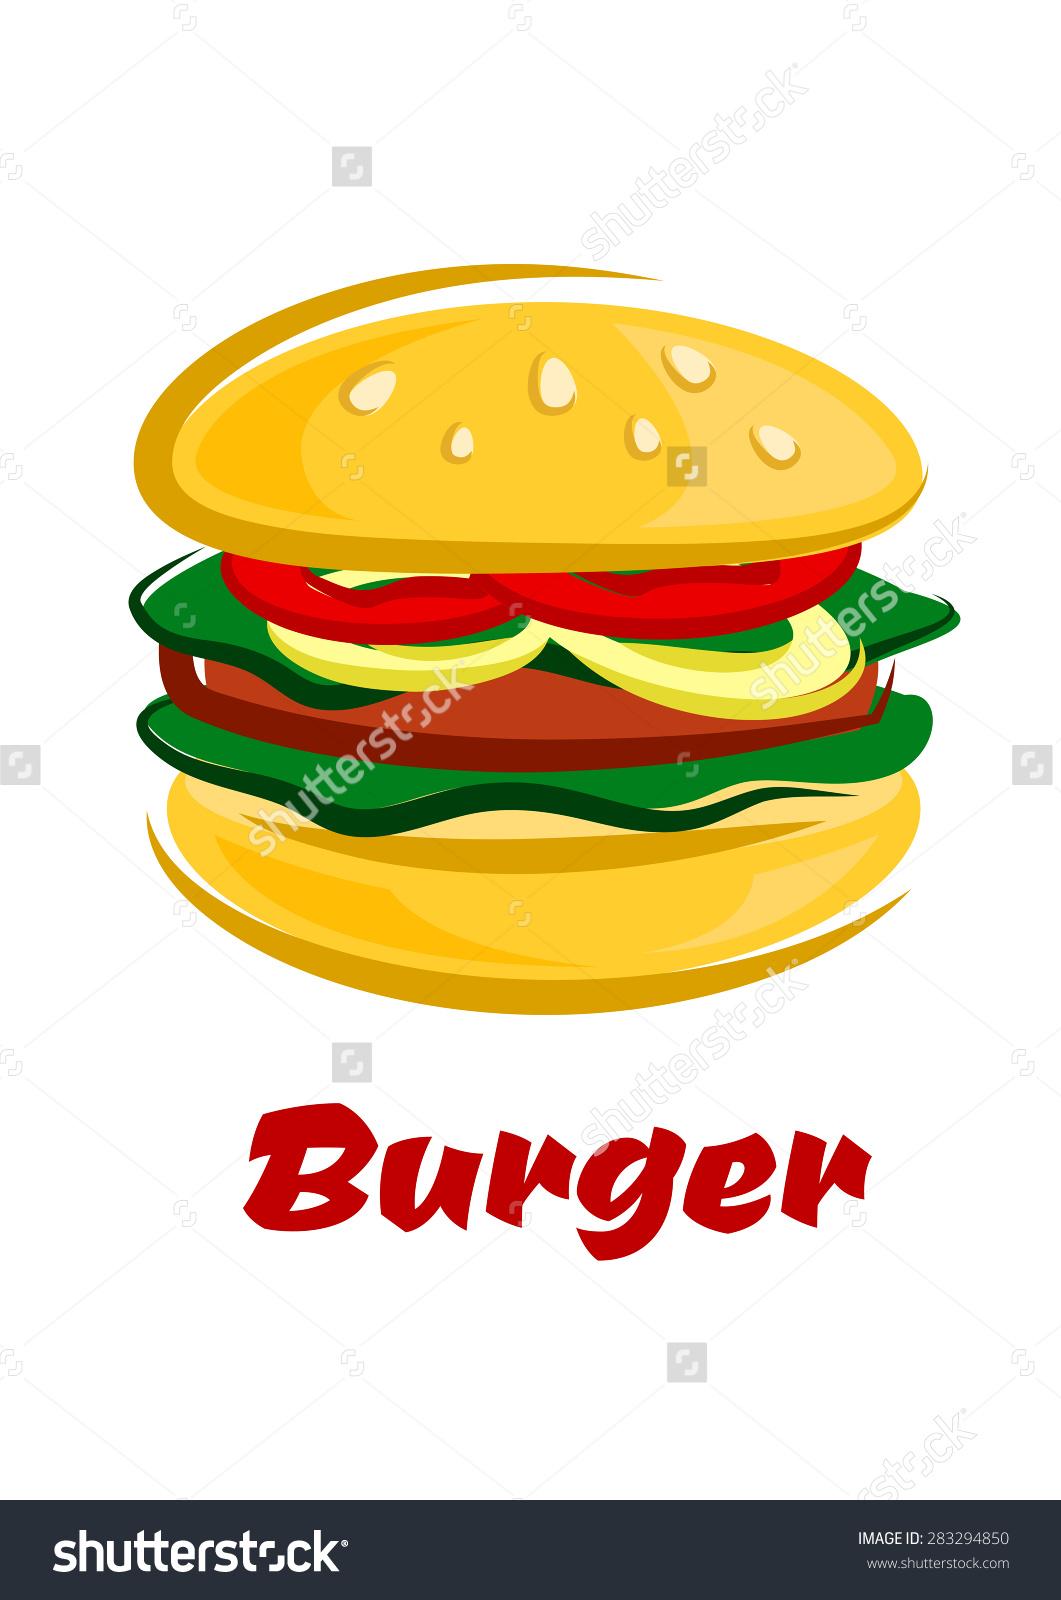 Tasty Burger Cartoon Style Sliced Tomato Stock Vector 283294850.